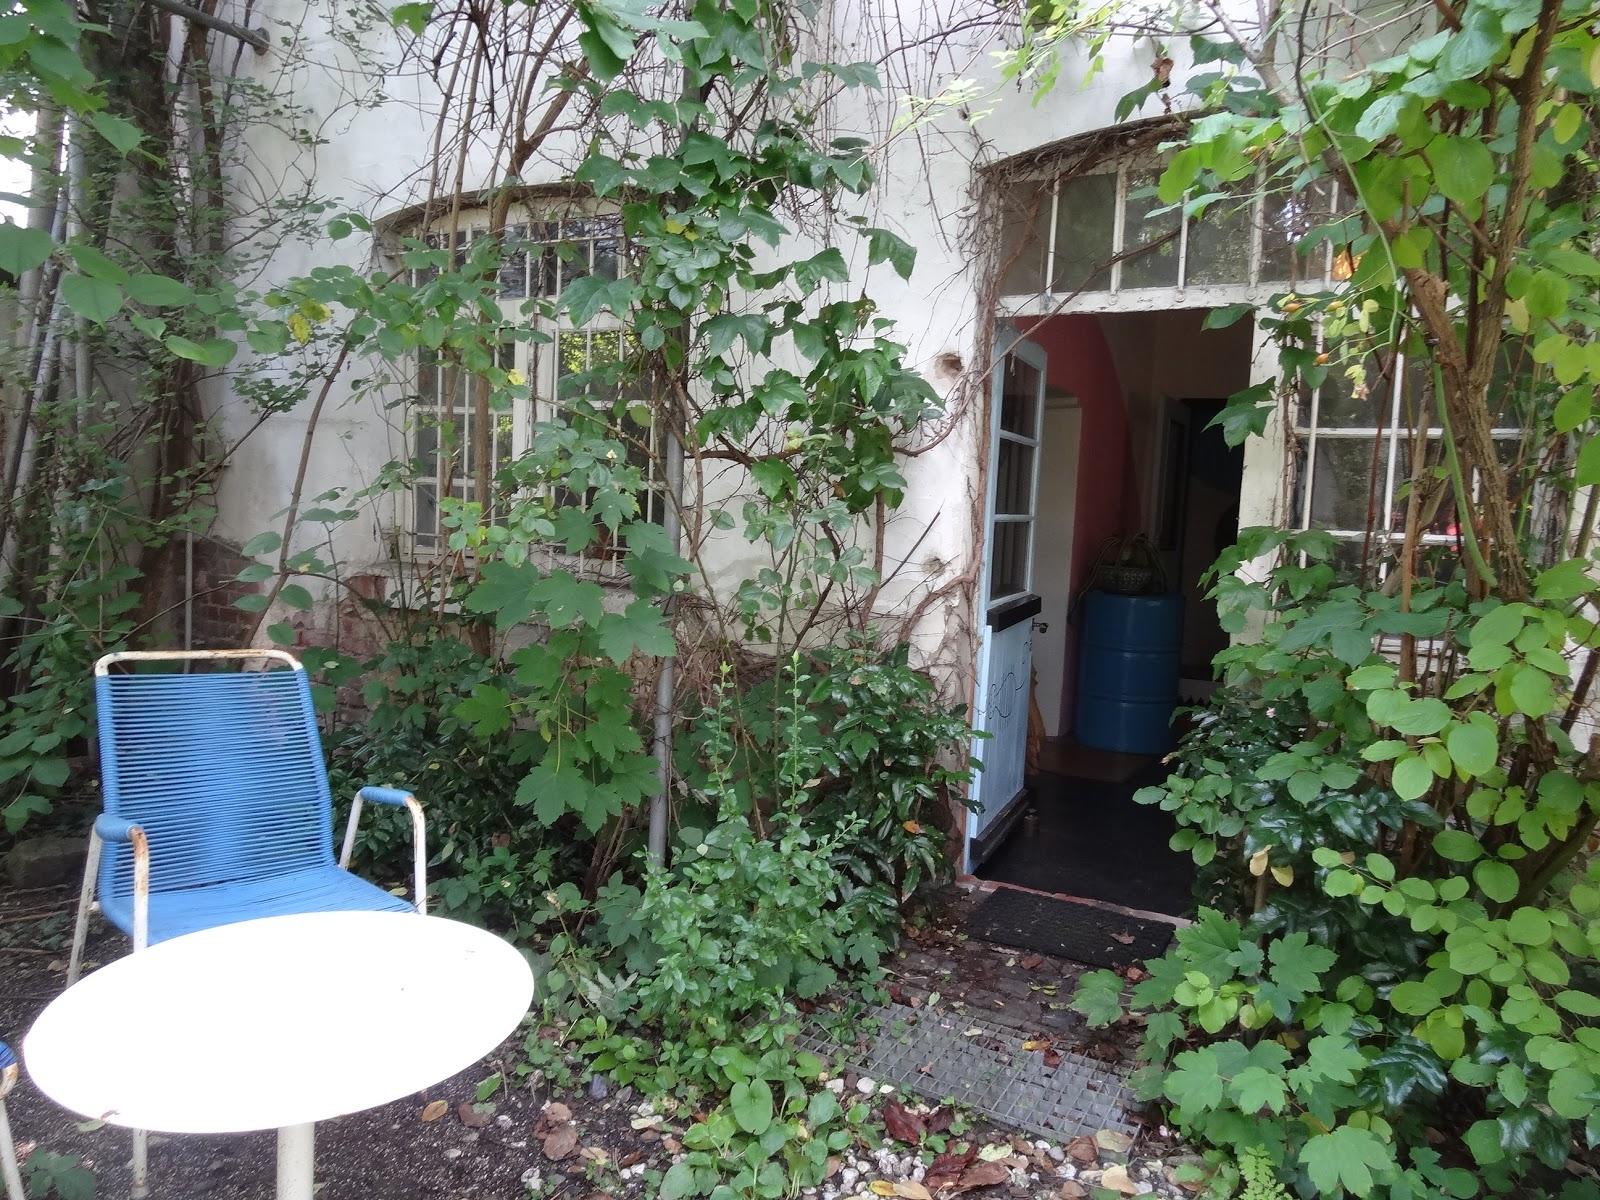 culturclash dickes berlin. Black Bedroom Furniture Sets. Home Design Ideas